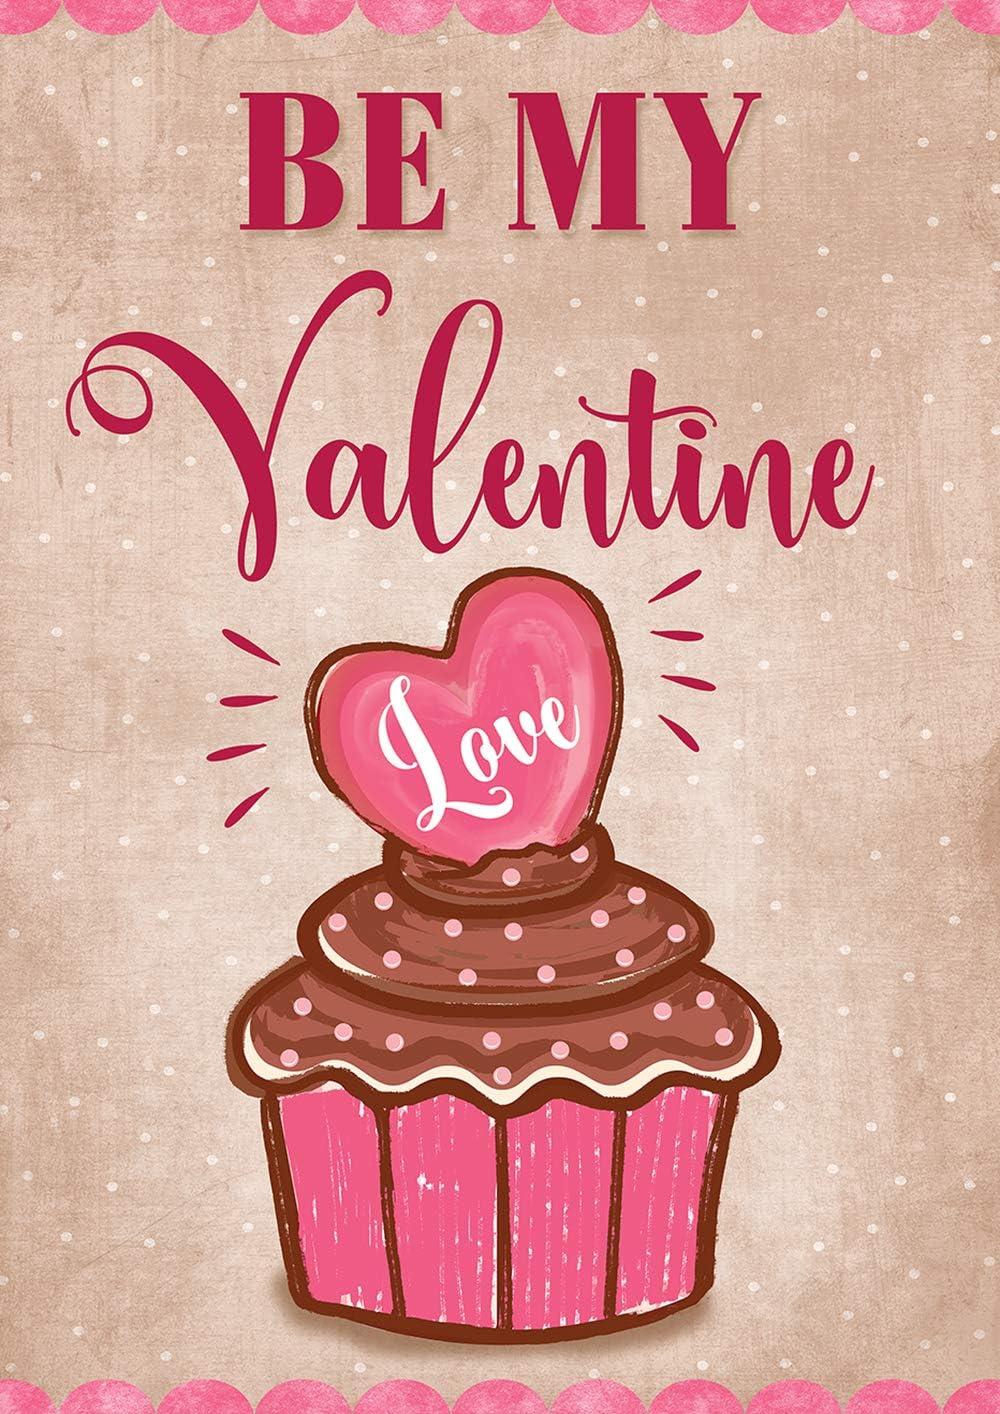 Toland Home Garden 1012281 Valentine Cupcake 28 x 40 Inch Decorative, Spring Love Heart Polka Dot, House Flag